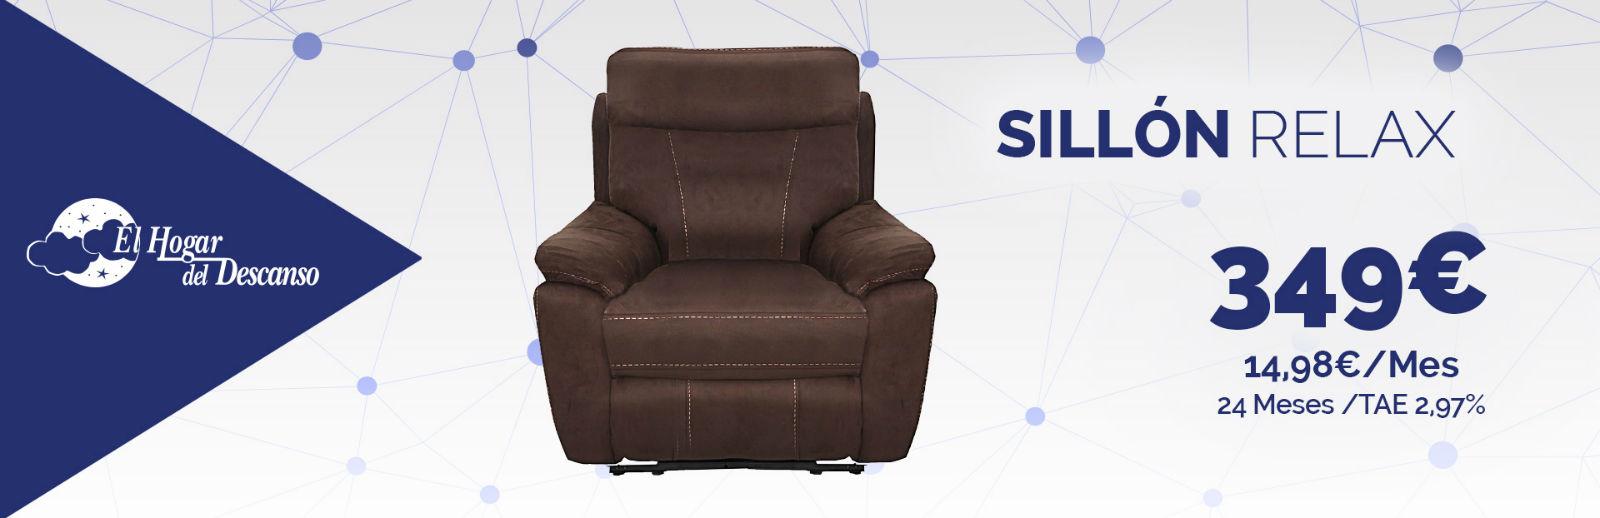 Sill n relax y chaiselongue promociones sillones tienda for Sofa almeria